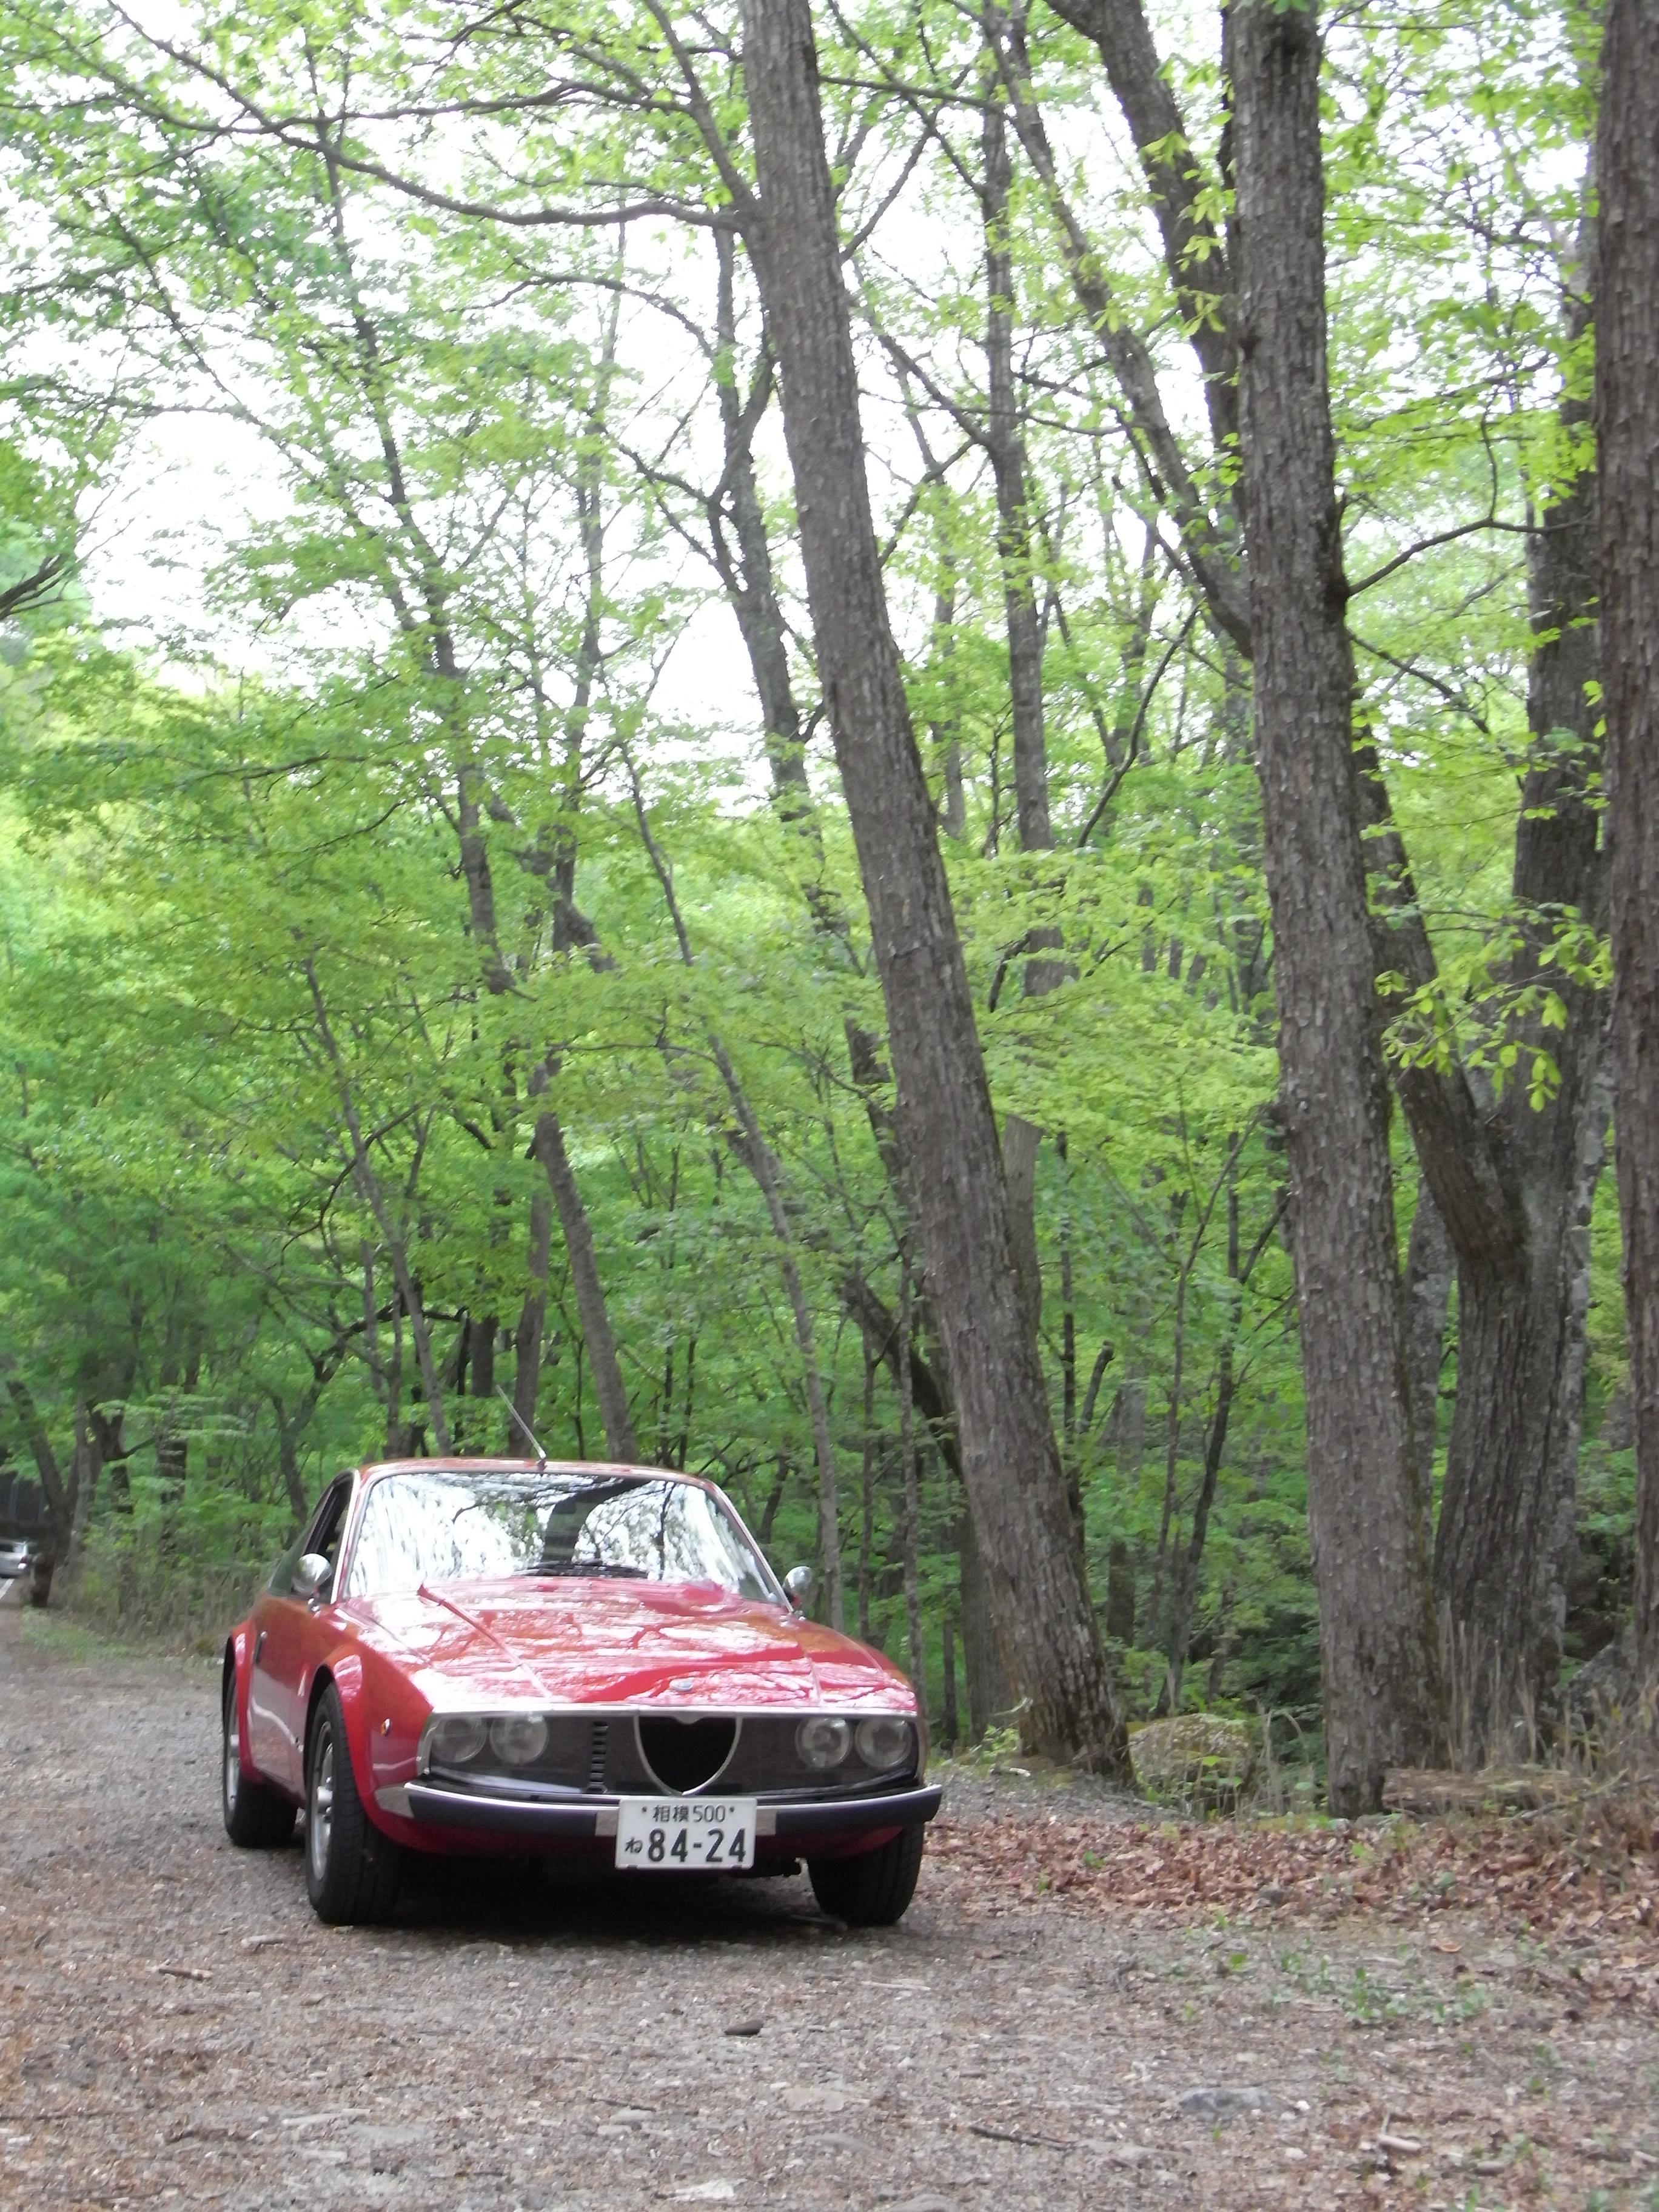 http://zagatoclub.jp/cars/027.JPG